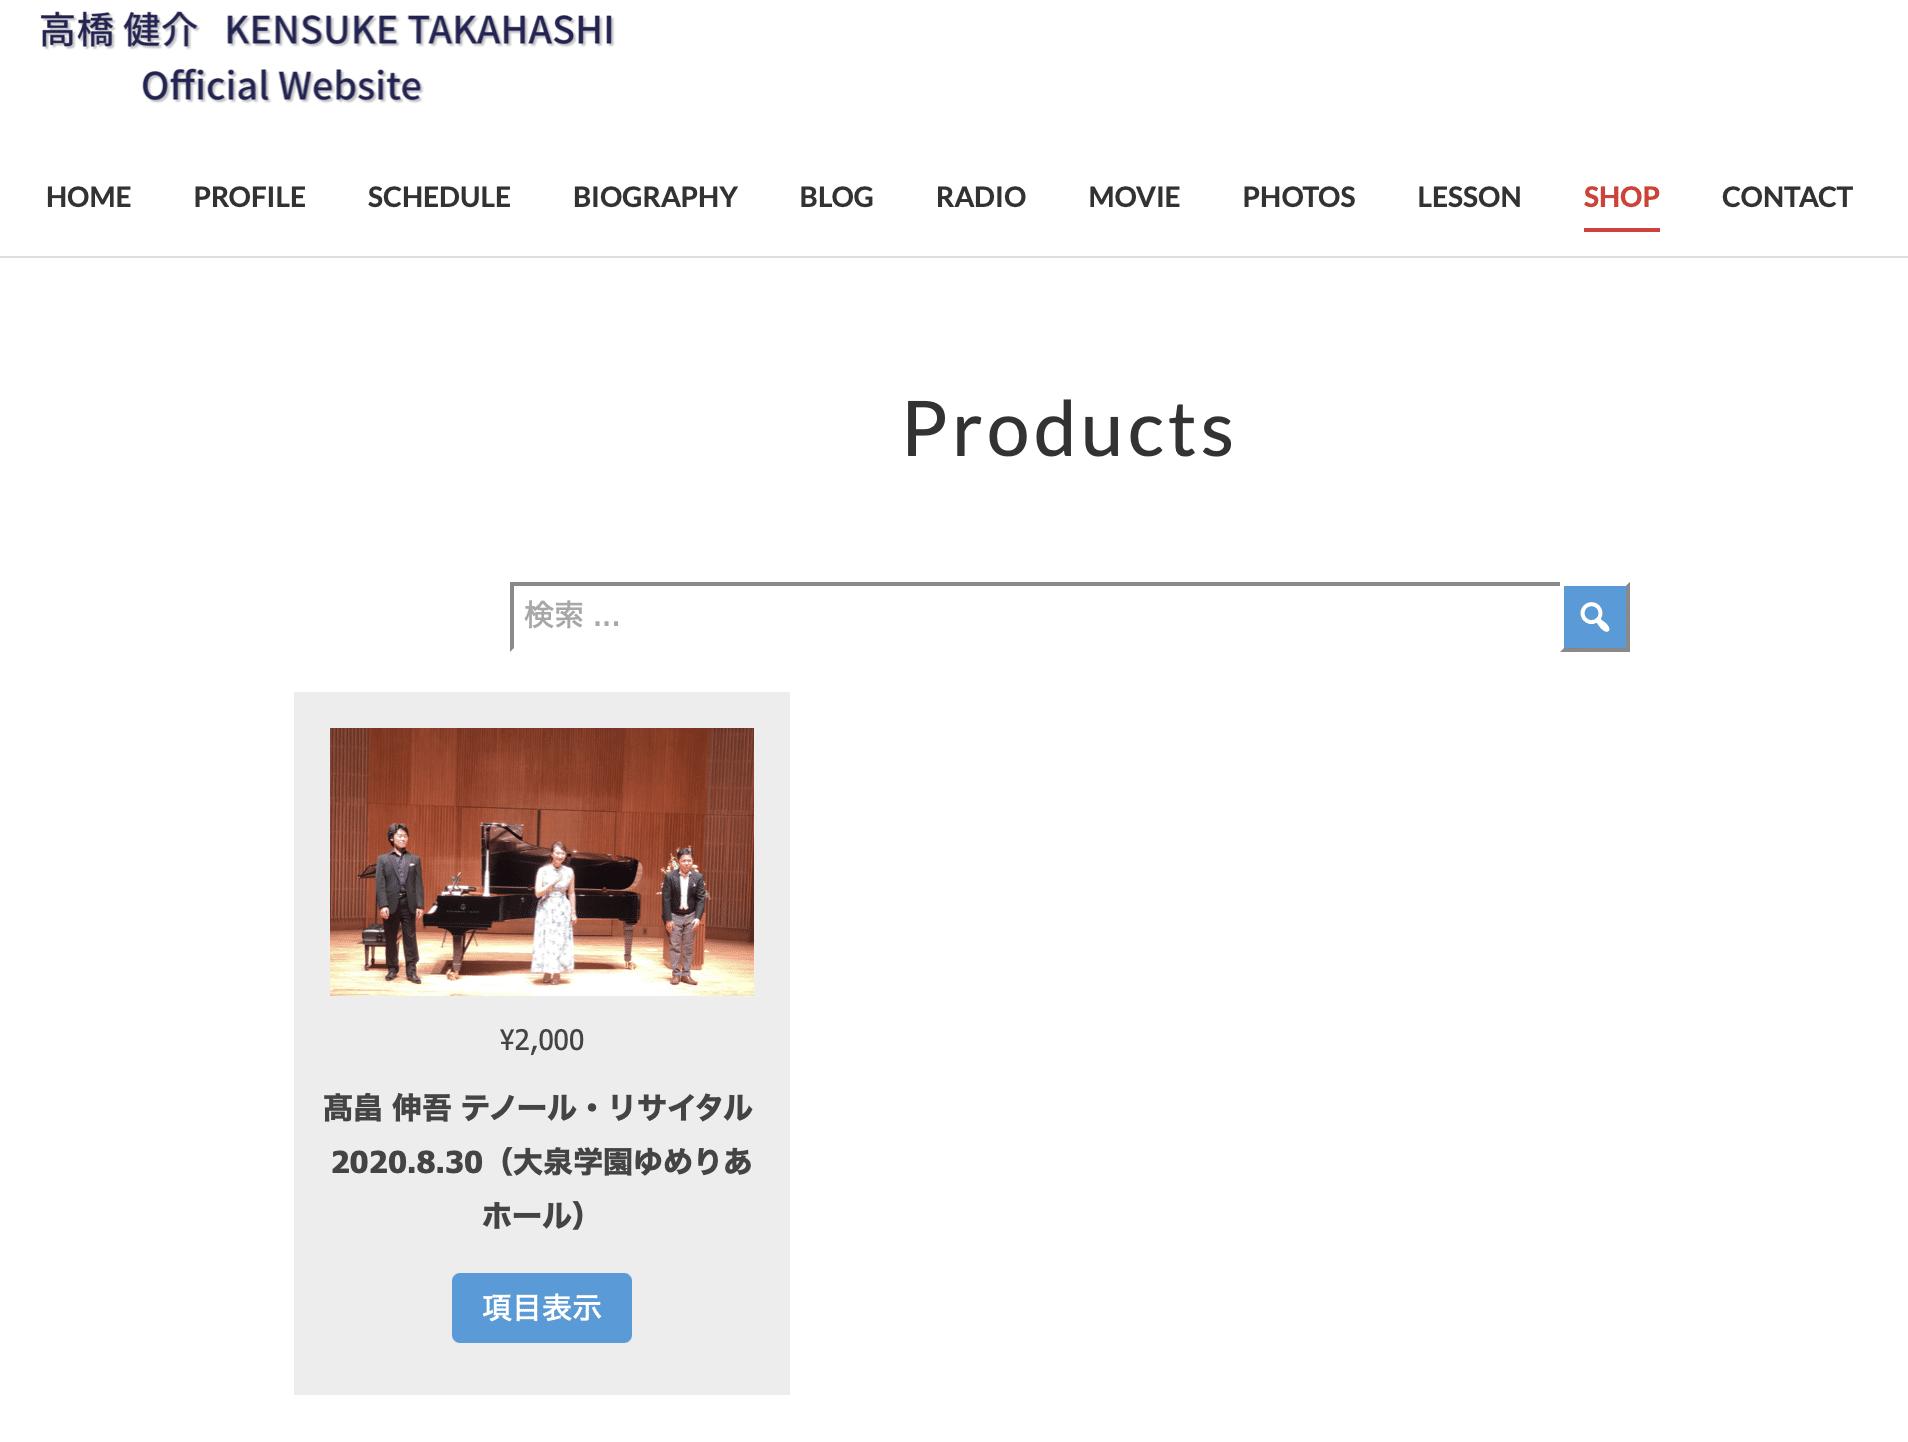 SHOPページを追加しました。過去のコンサートの動画を販売しています。